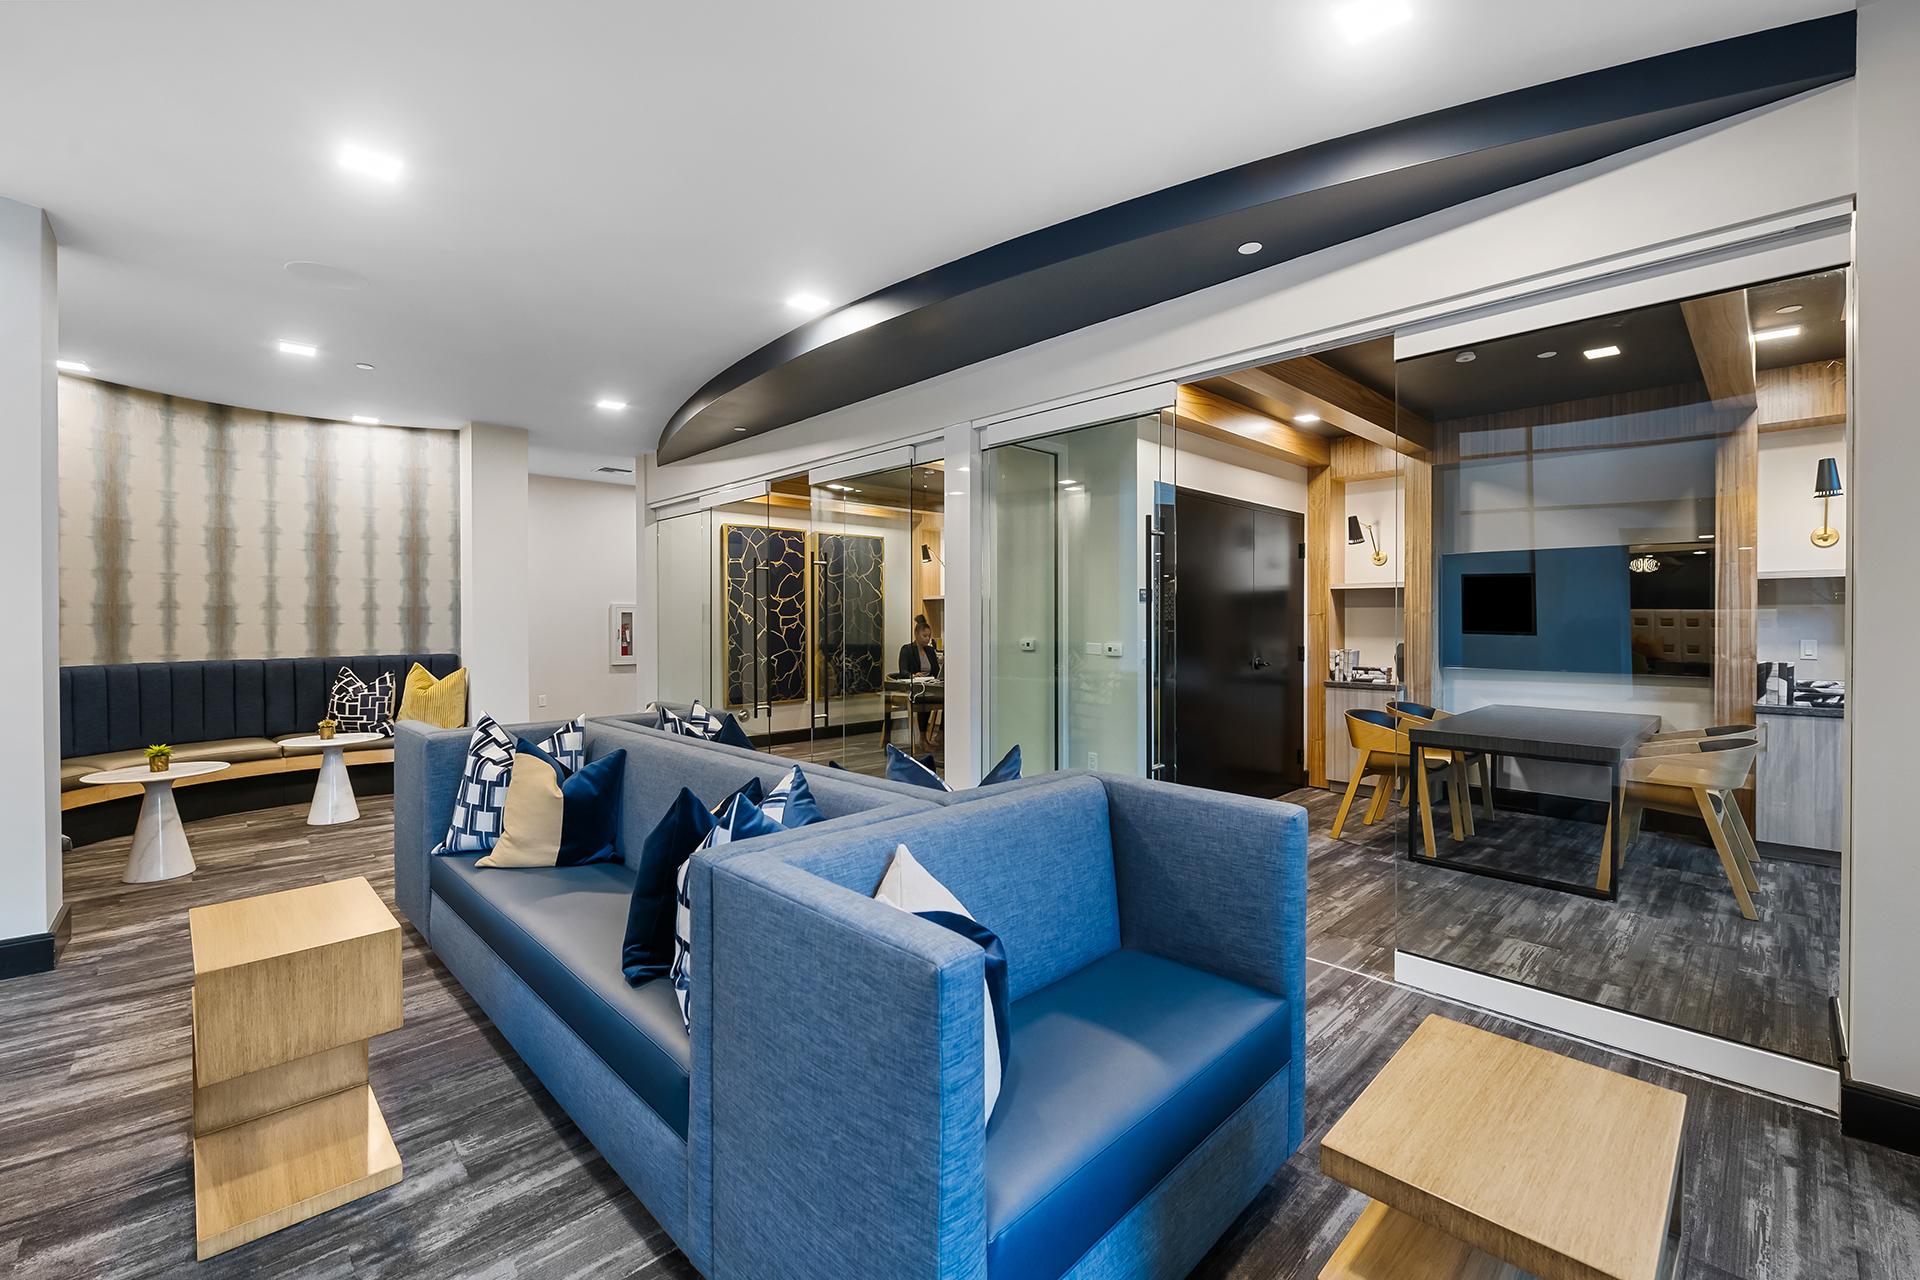 Aura Boca Apartments resident work spaces